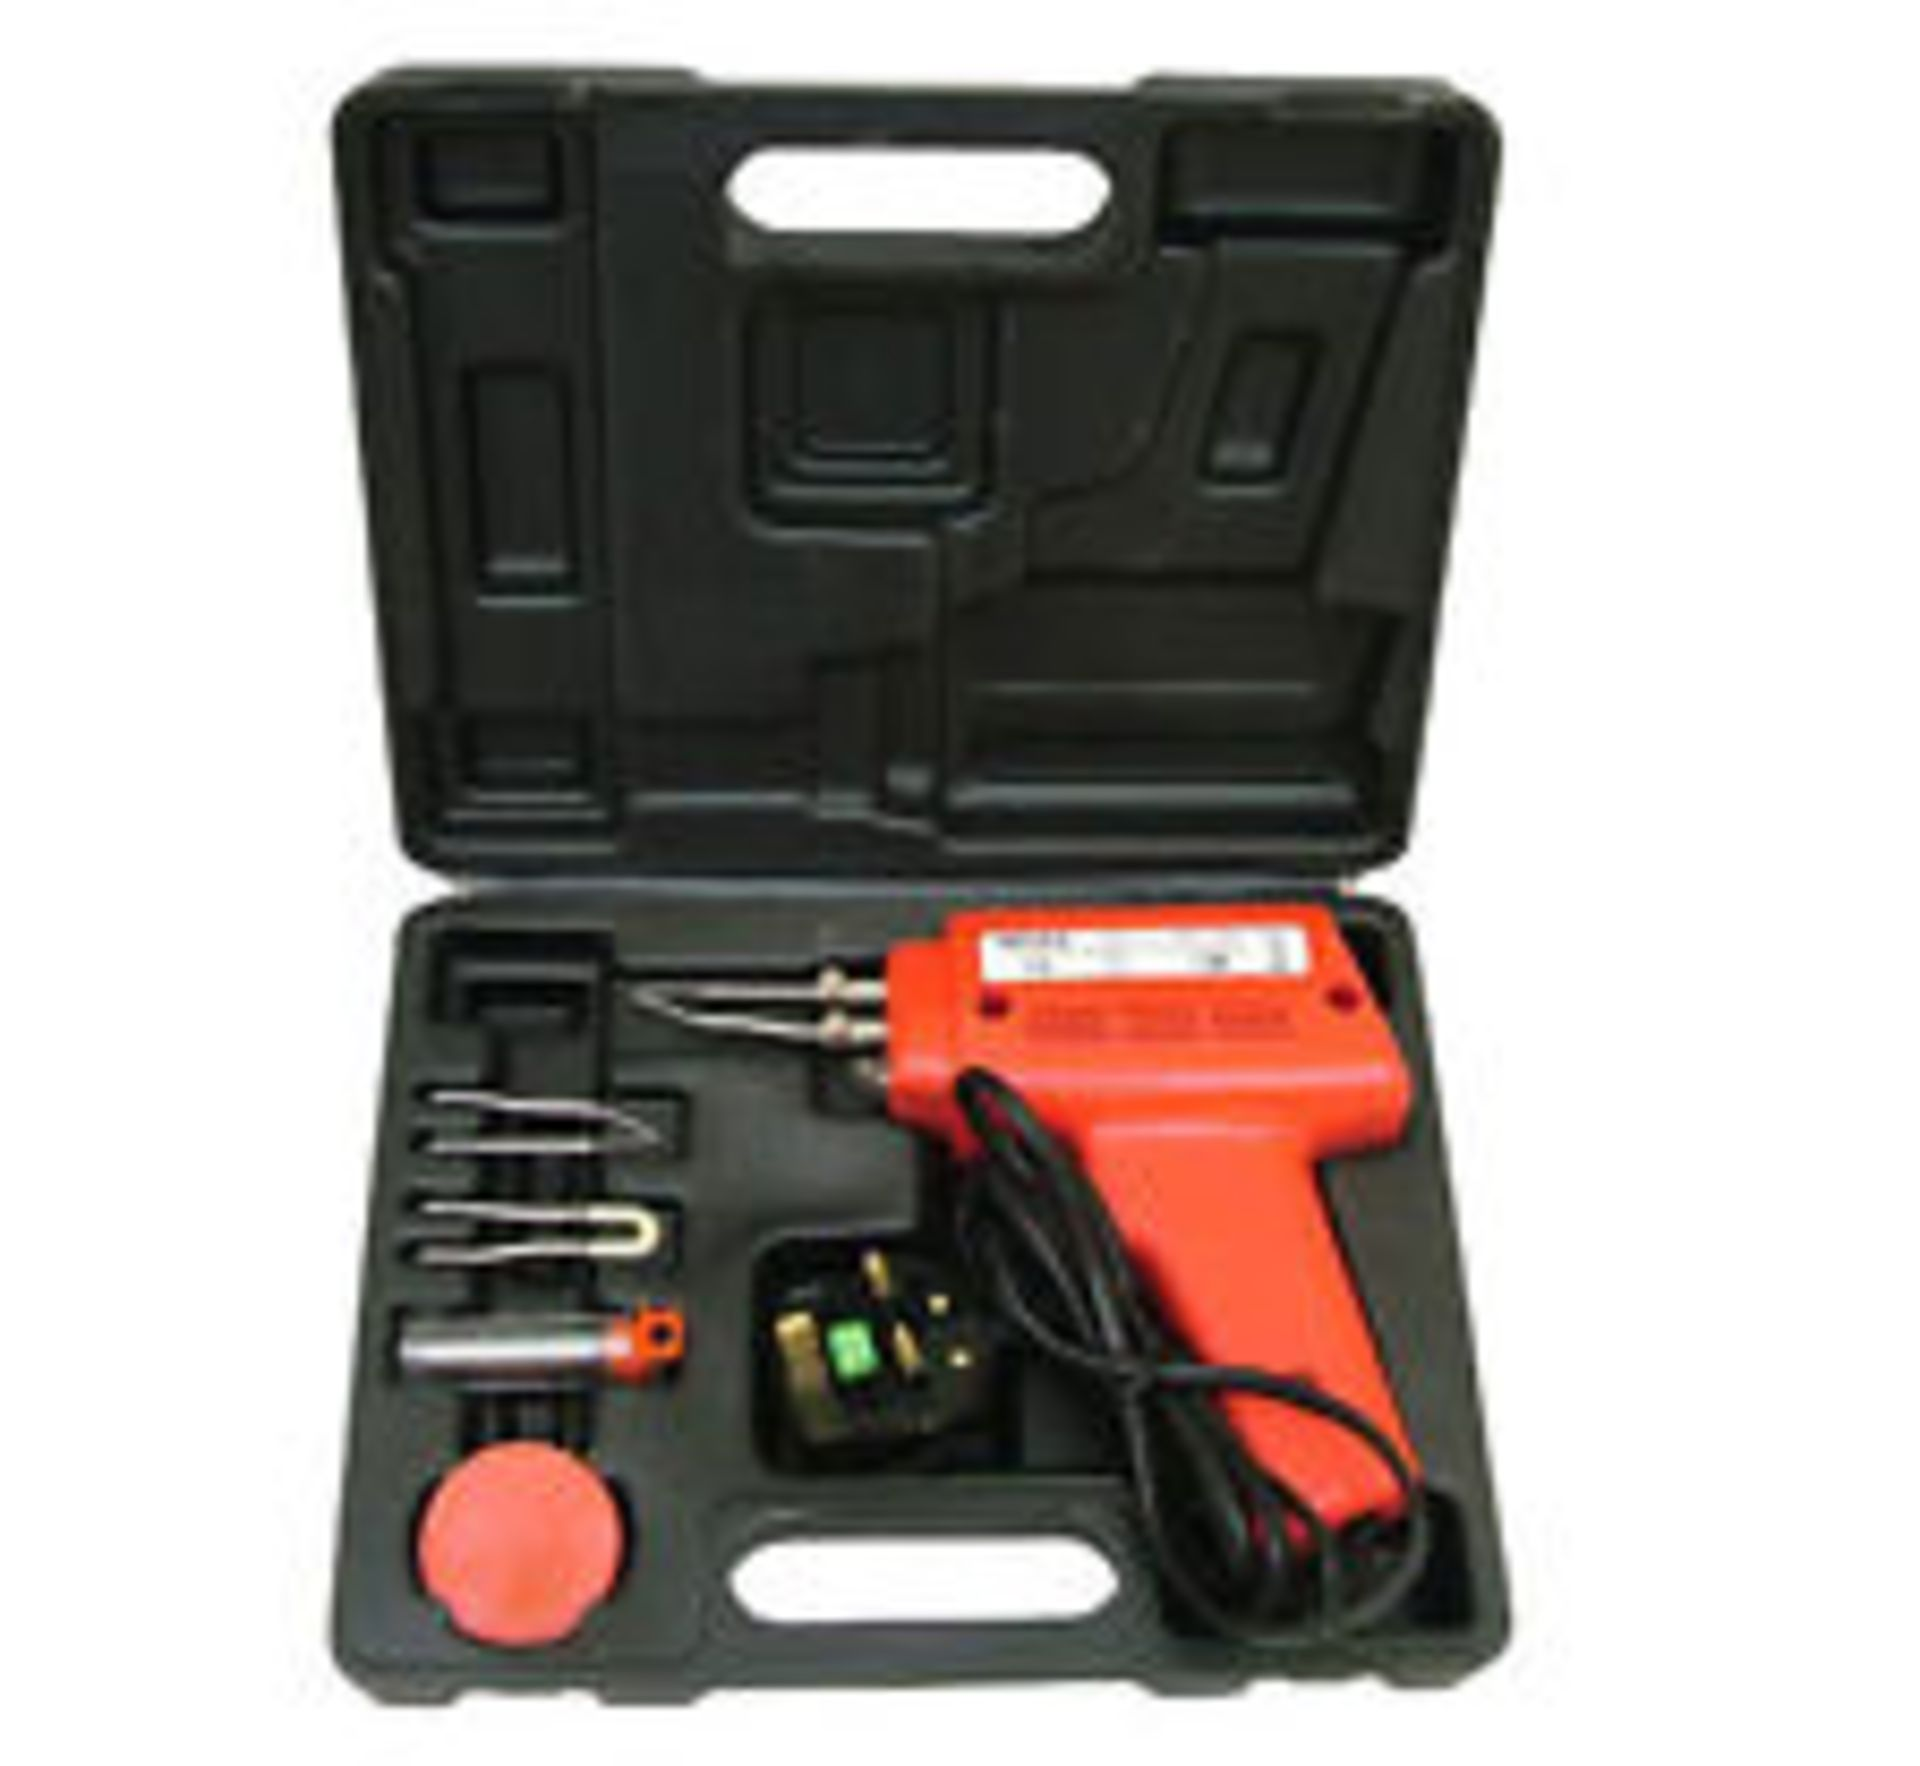 Lot 13573 - + VAT Brand New 175 Watt Electric Soldering Gun Kit